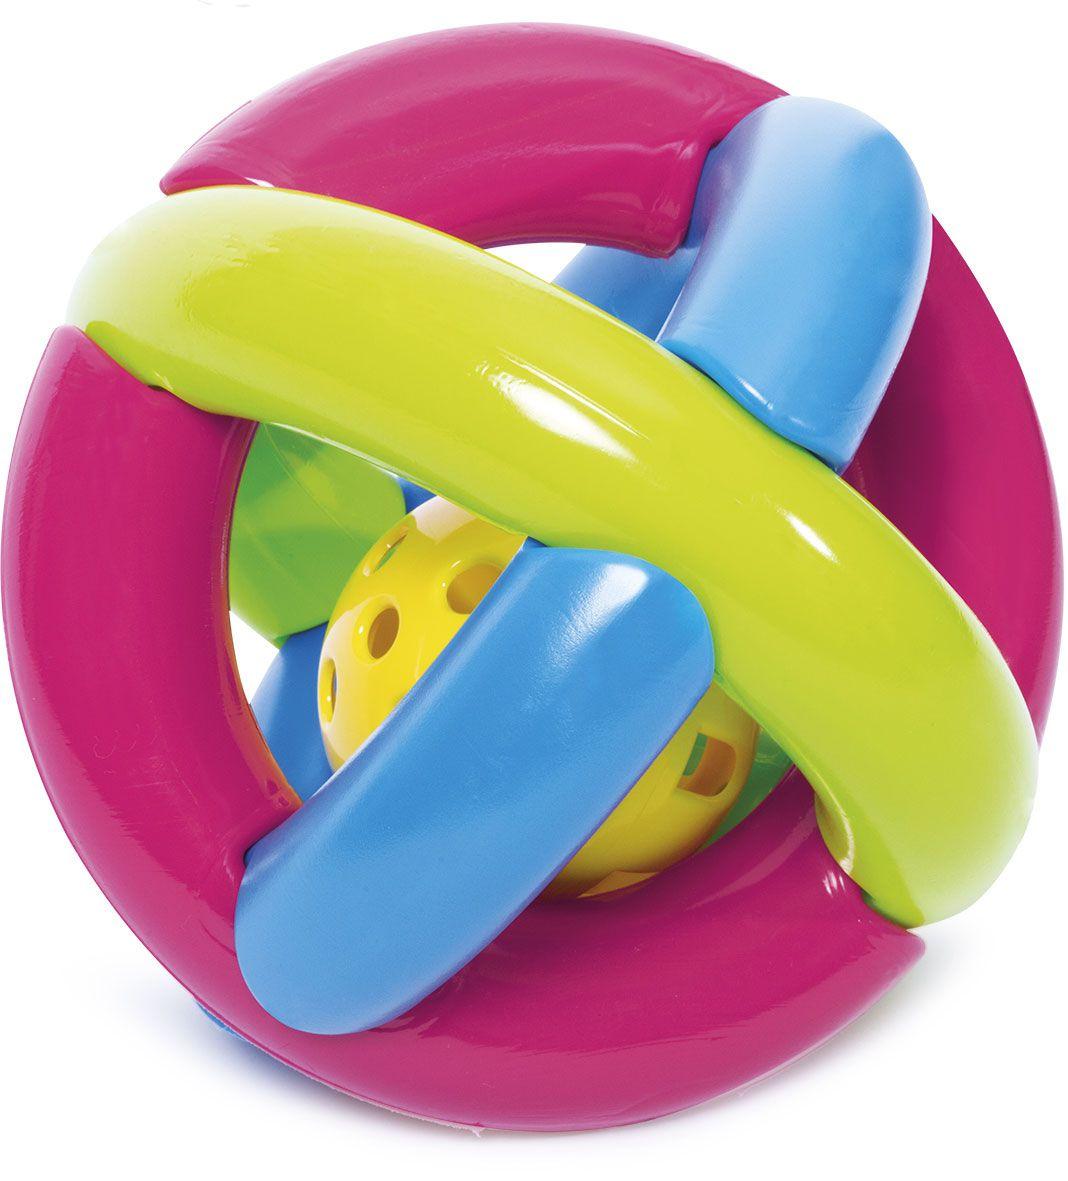 Kit de Brinquedos para Bebês Especial de Natal